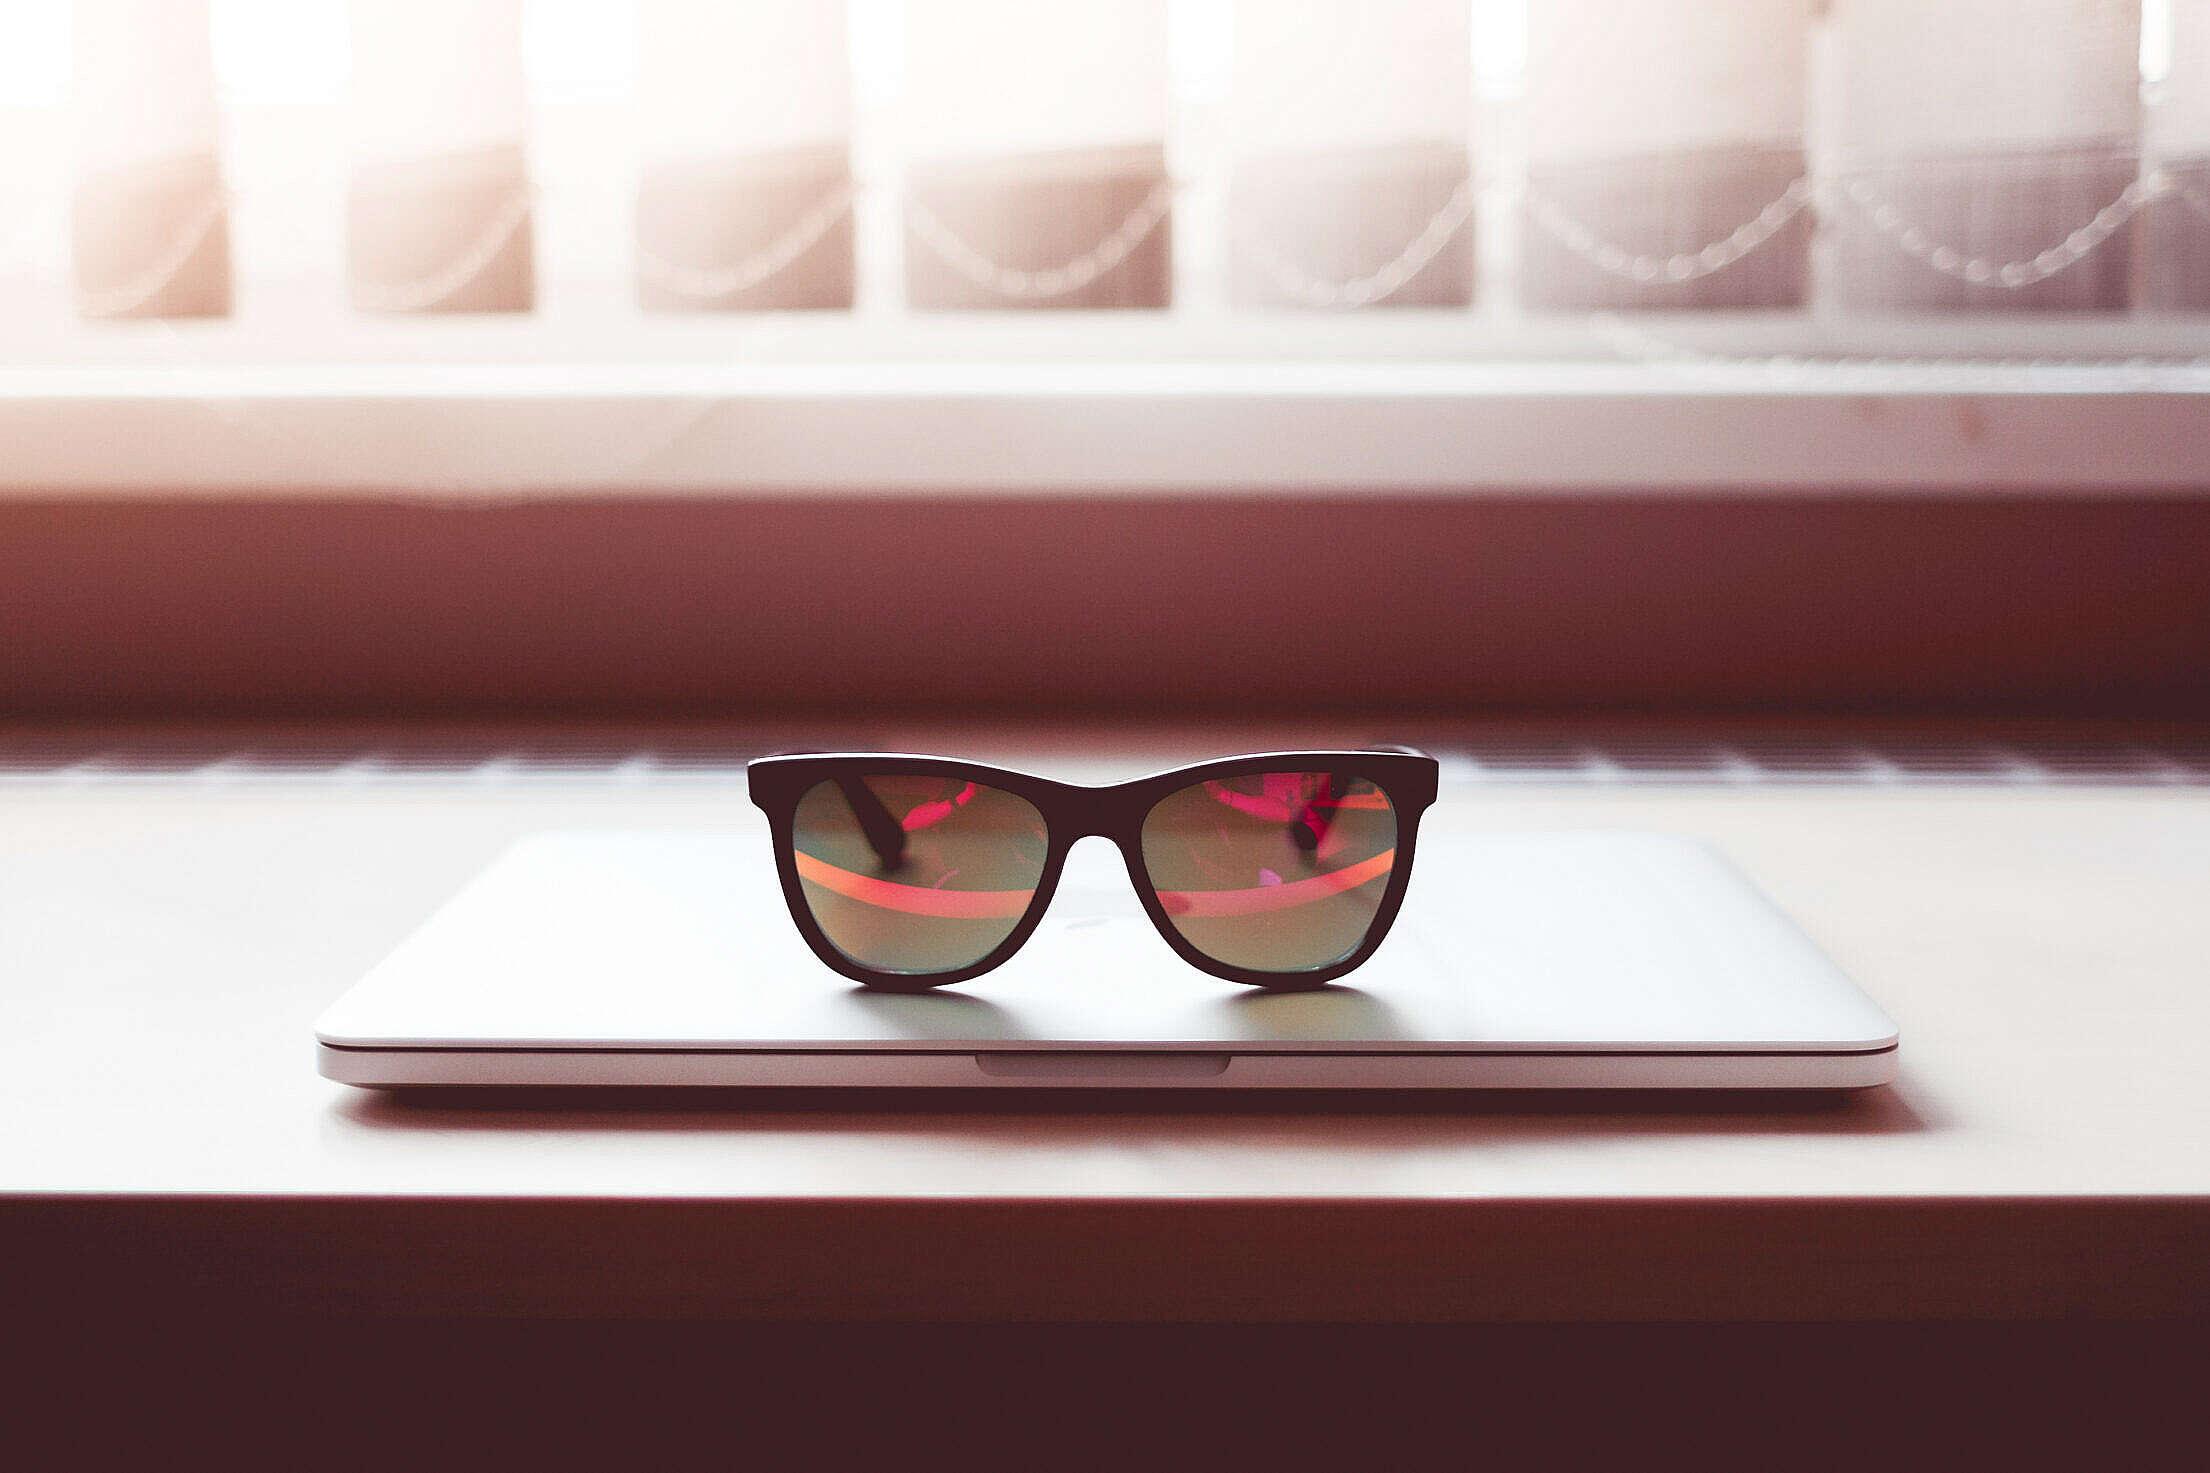 Sleek Sunglasses on Closed MacBook Laptop Free Stock Photo